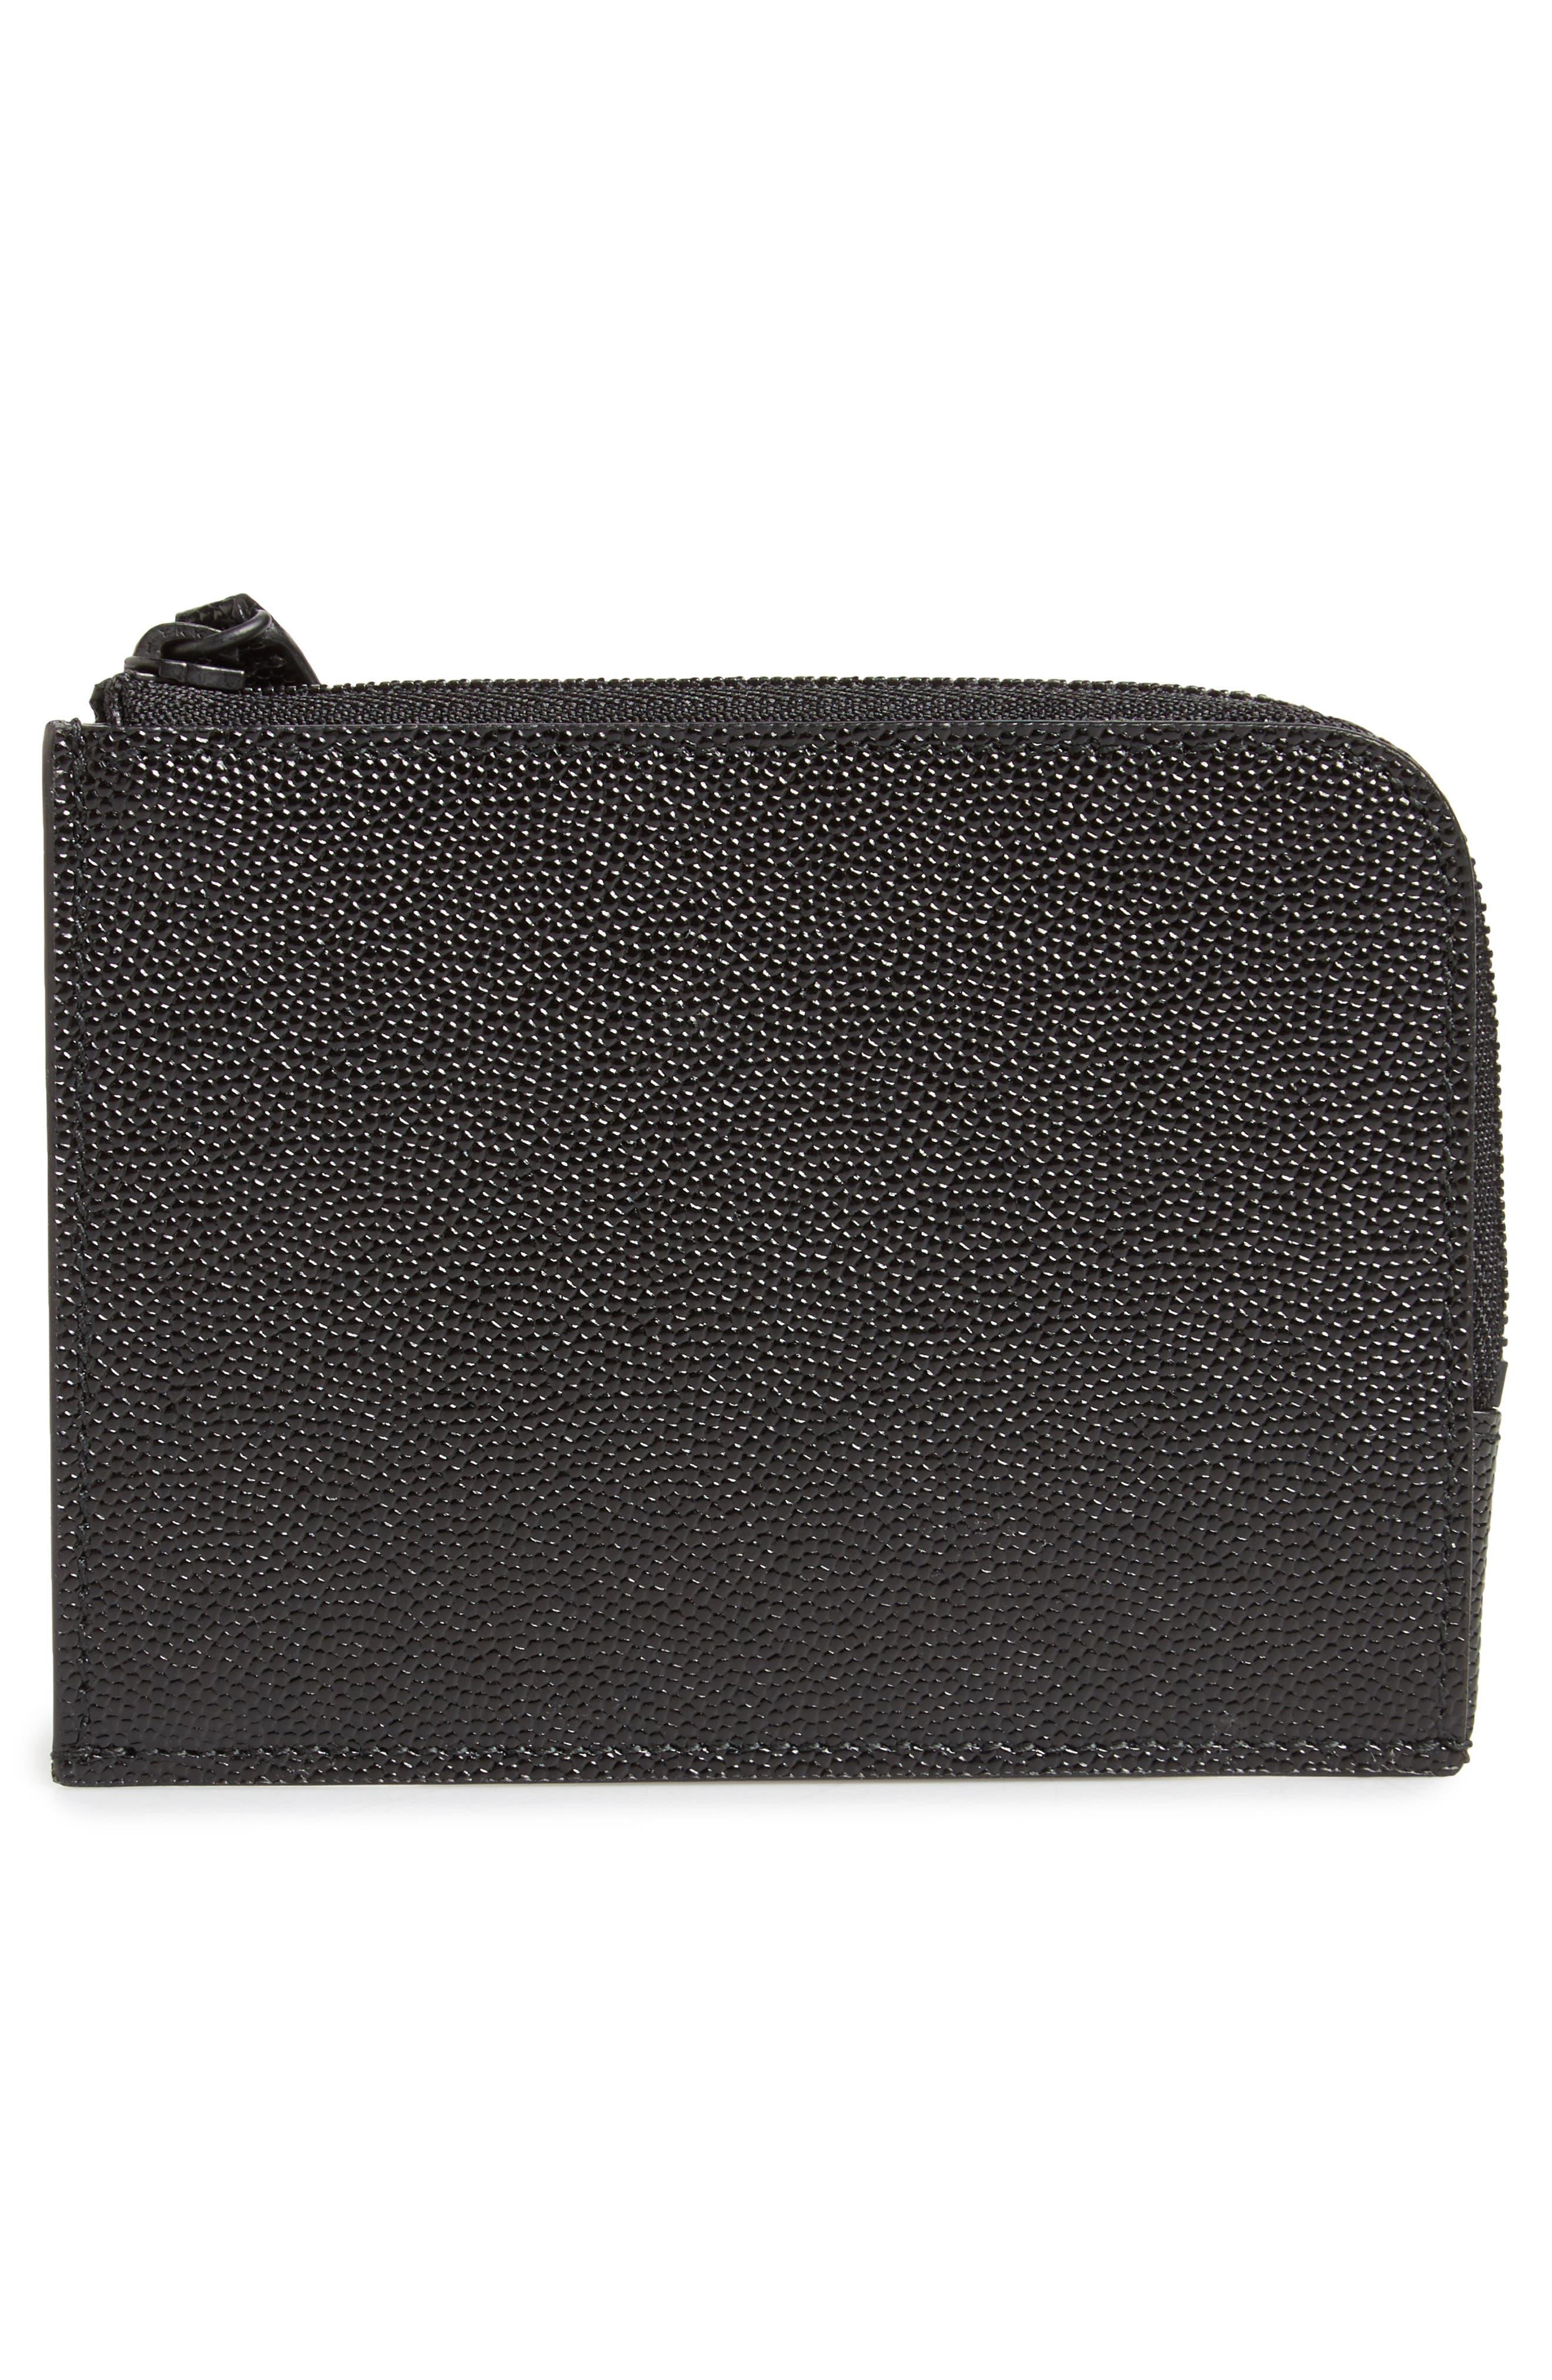 Pebble Leather Zip Wallet,                             Alternate thumbnail 3, color,                             001